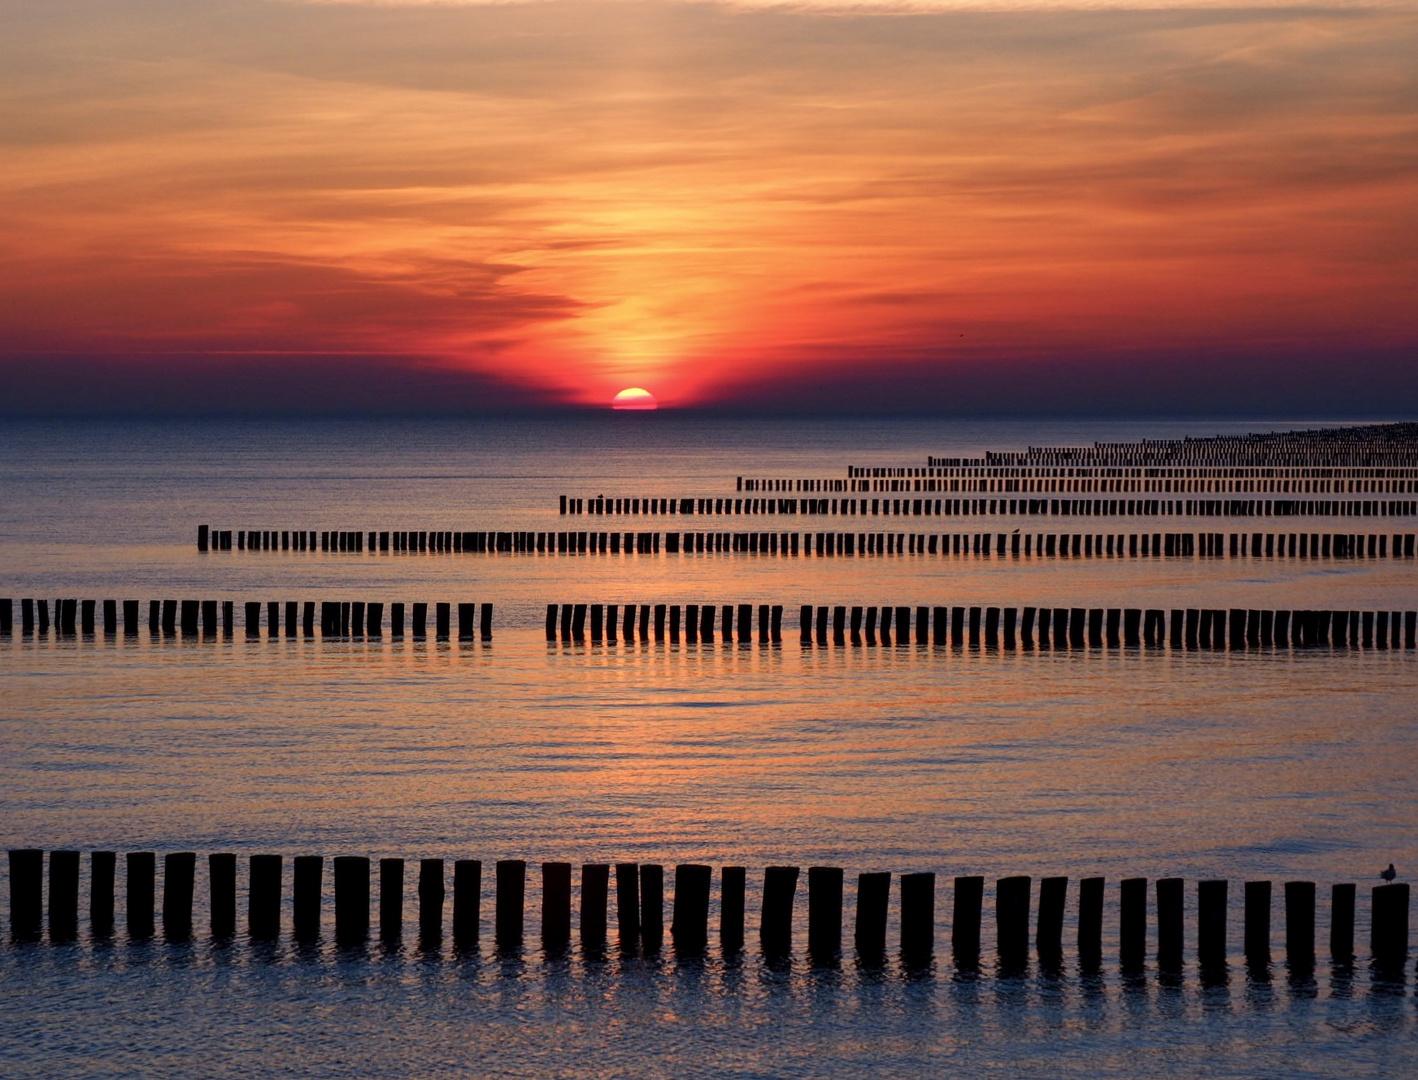 Morgens zum Sonnenaufgang